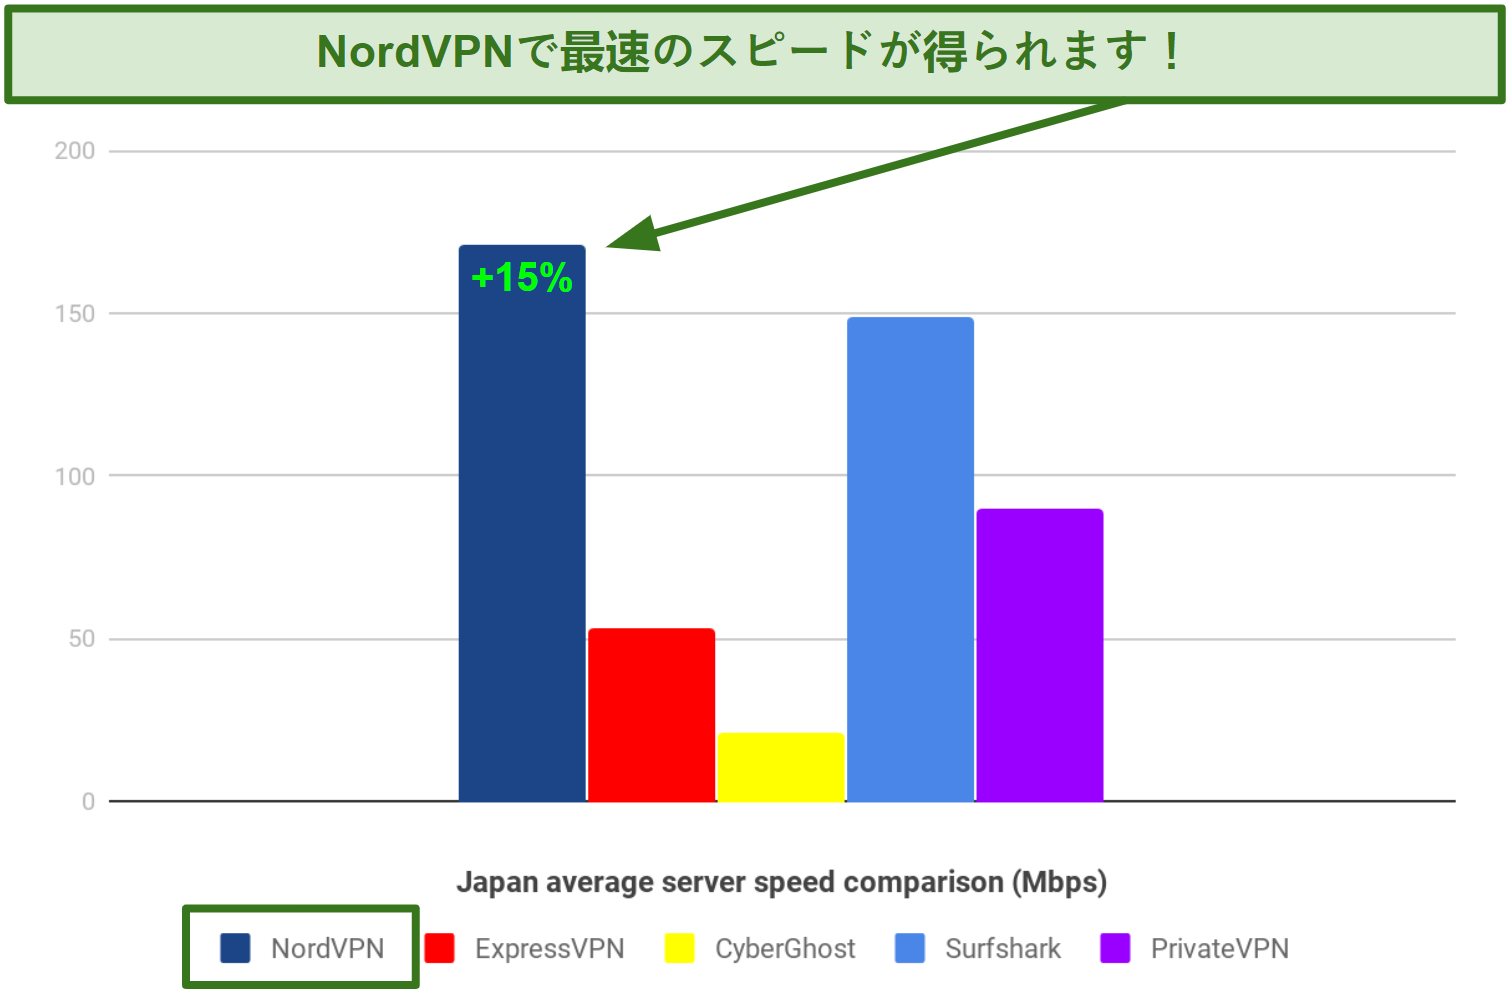 NordVPN、ExpressVPN、CyberGhost、Surfshark、PrivateVPNの速度の違いを示す棒グラフ。NordVPNが最速です